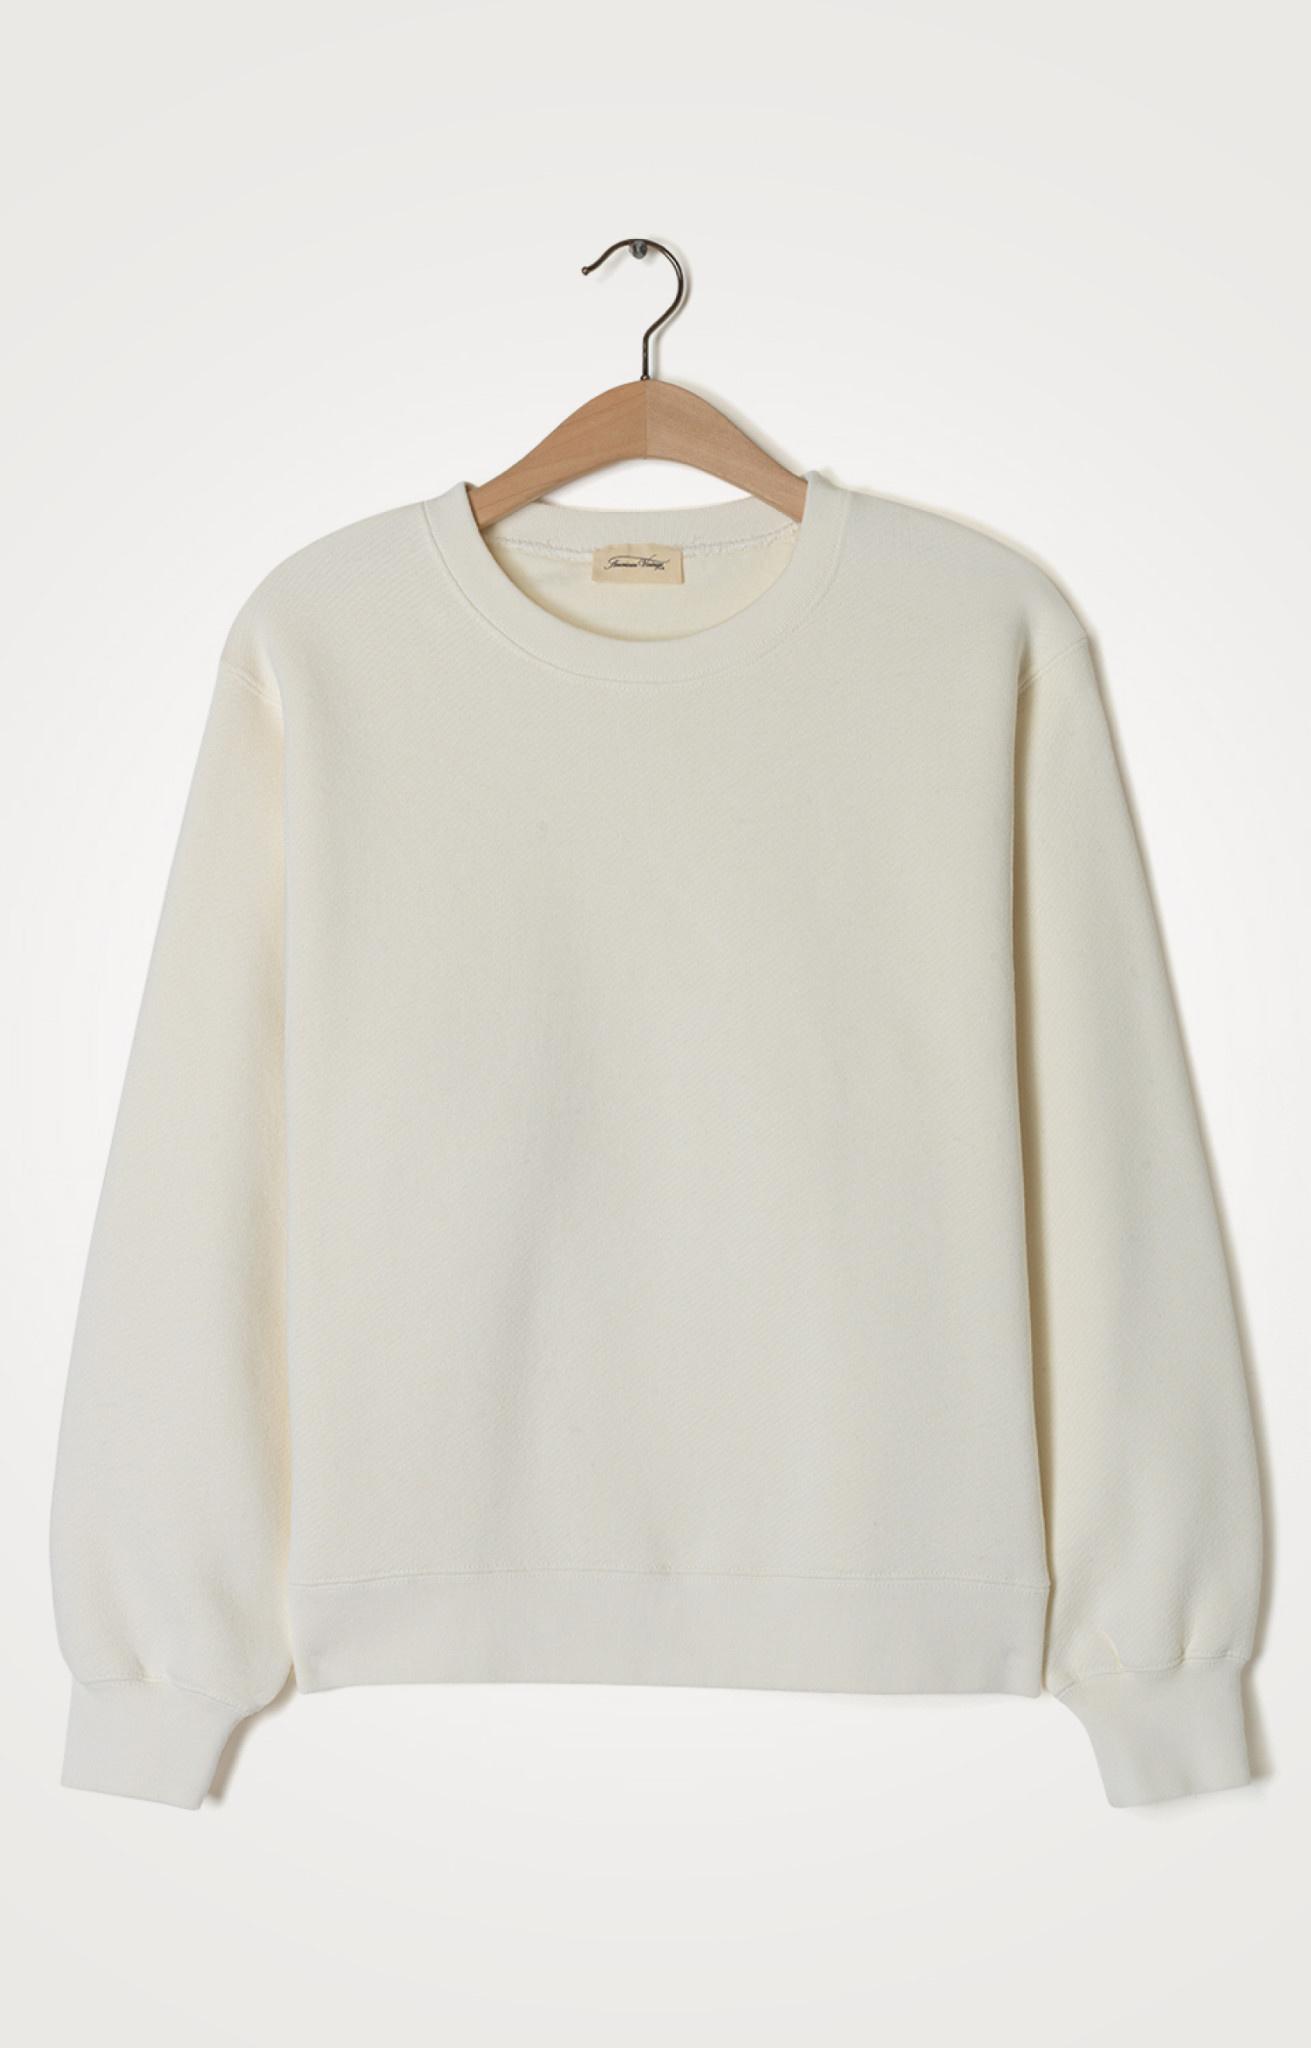 Ibowie Loose Sweatshirt Ecru White-1